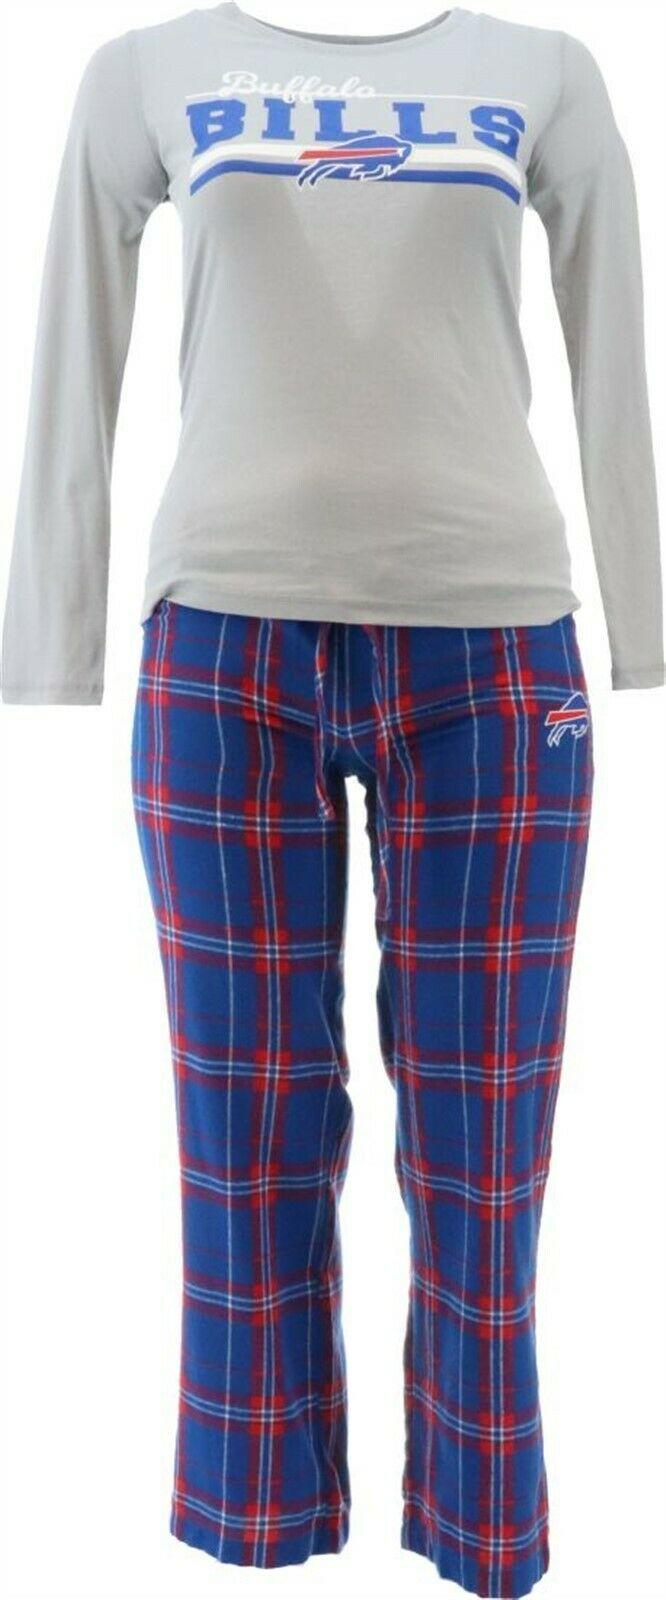 NFL Women's Pajama Set Long Slv Top Flannel Pants Bills M NEW A387687 - $30.67